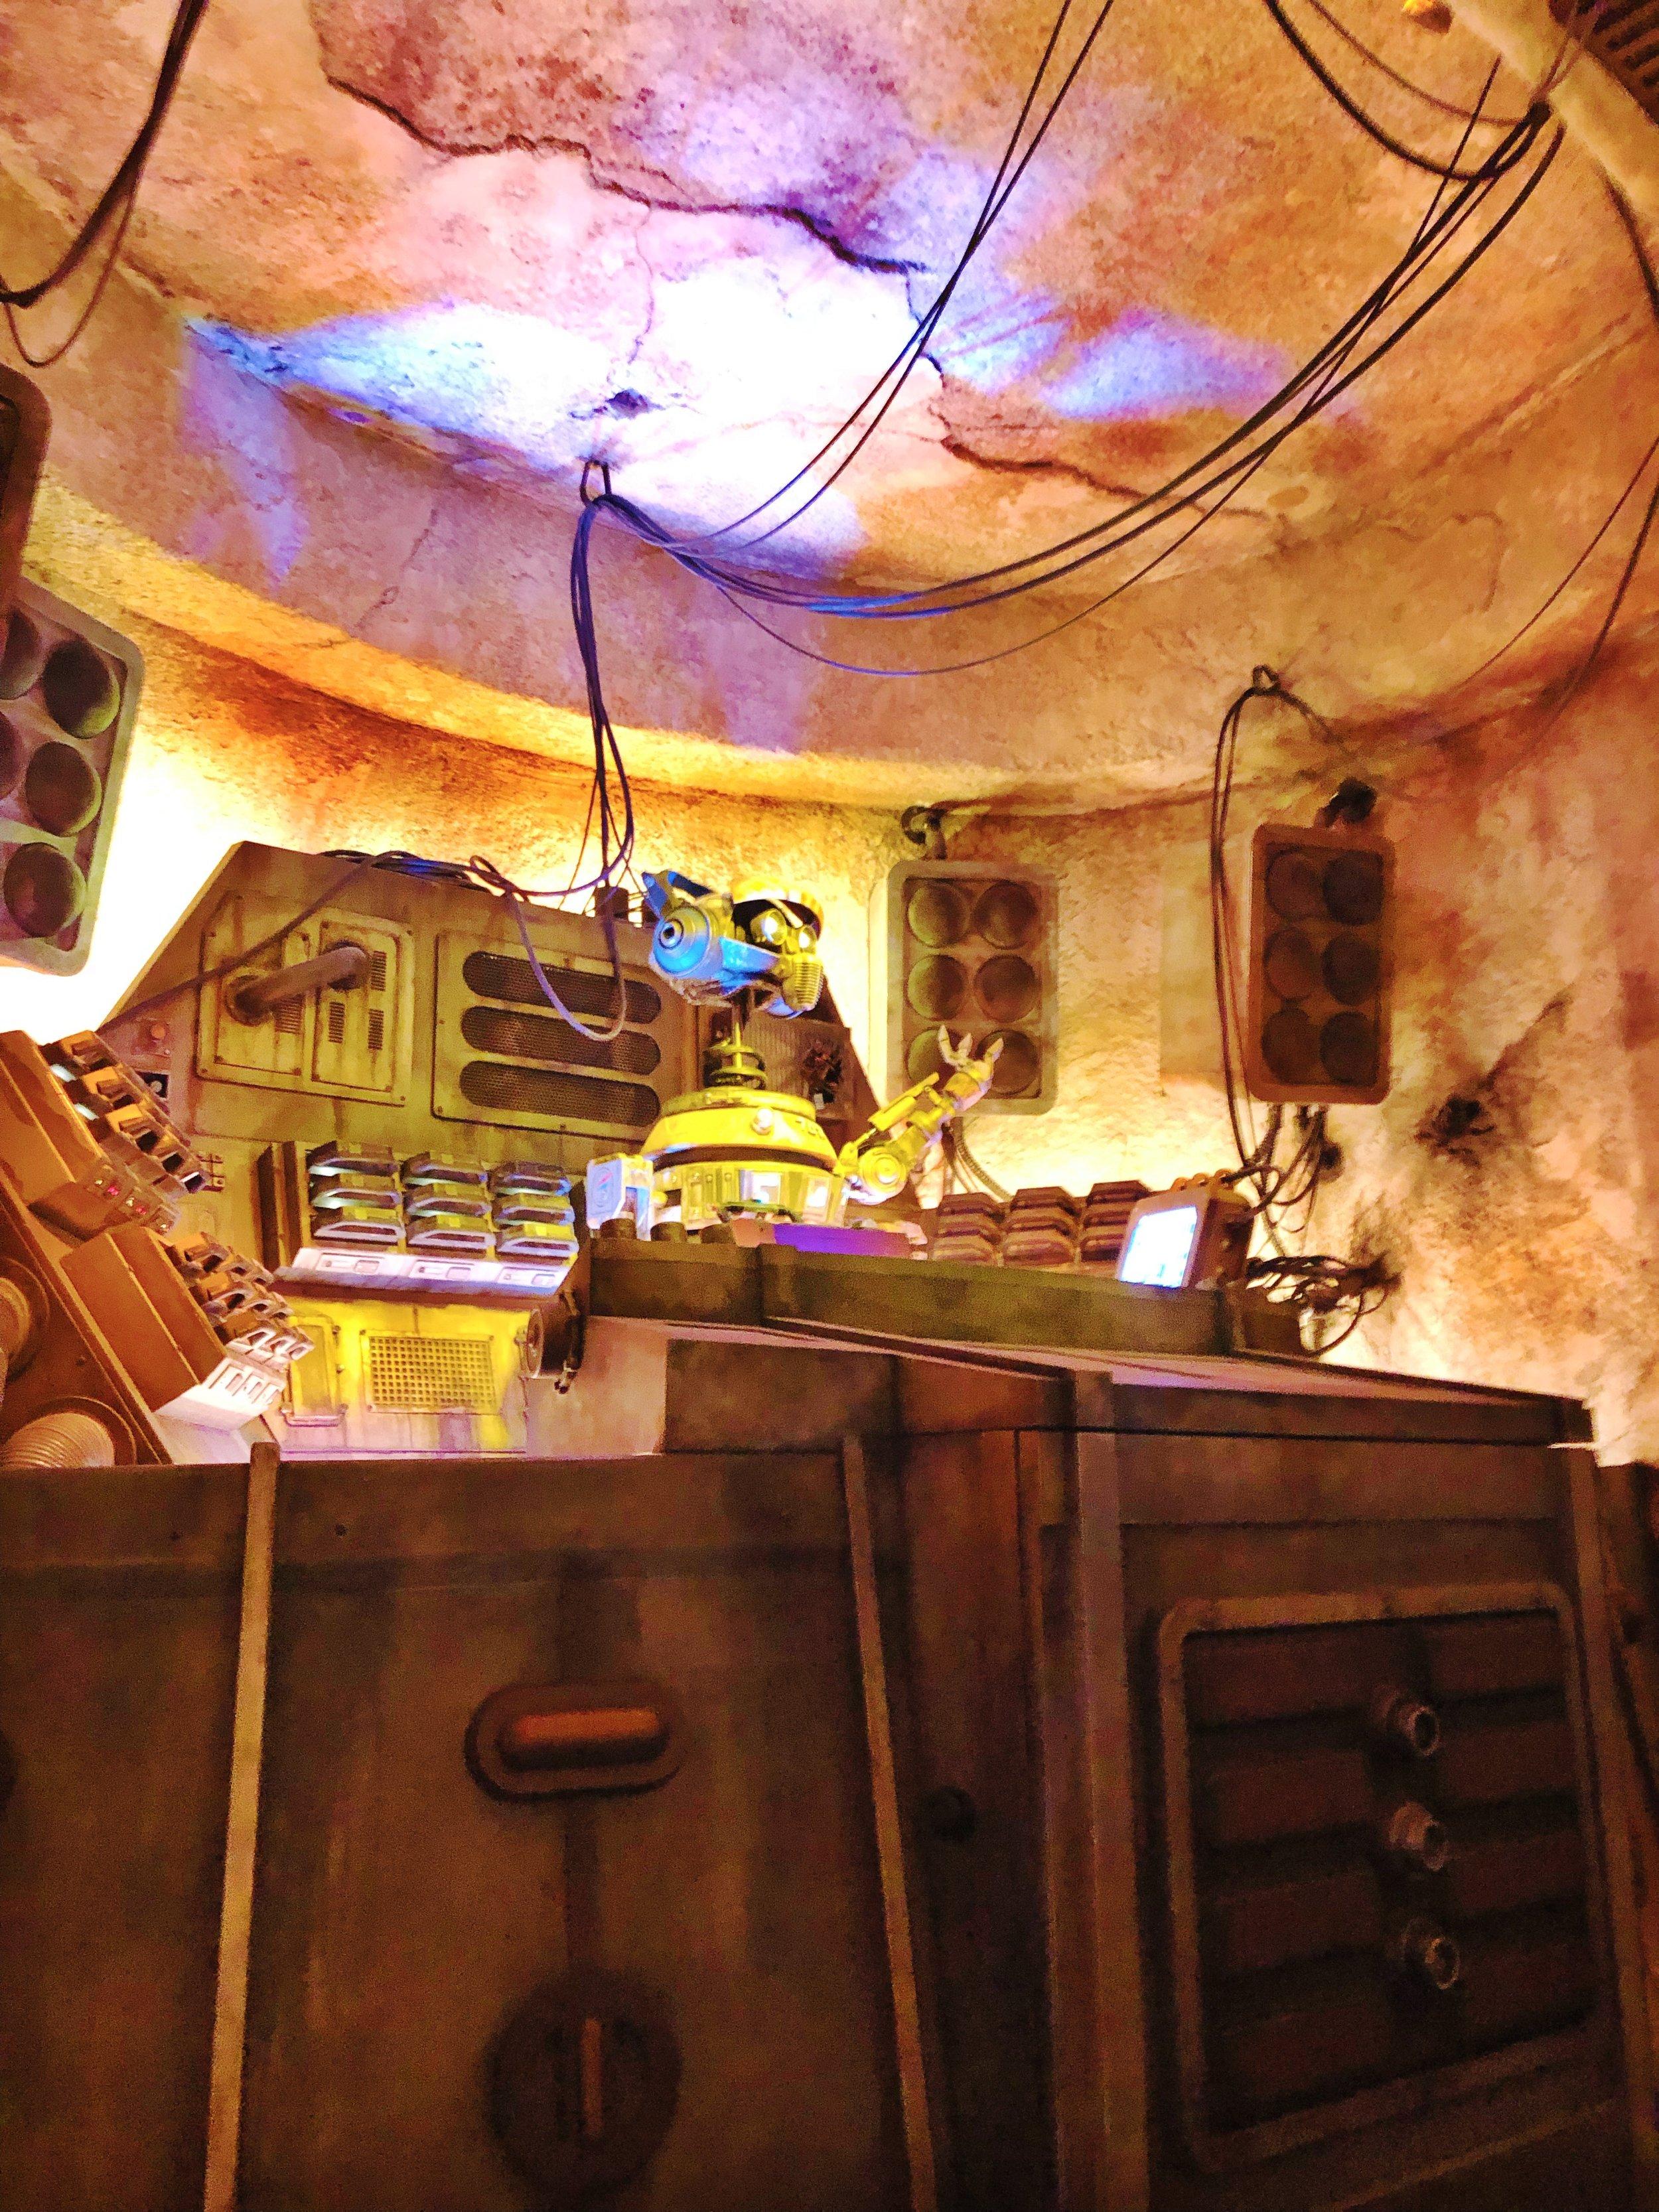 Oga's Cantina Review. #Batuu #StarWars #StarWarsLand #OgasCantina #Ogas #Disneyland #Disney #StarWarsGalaxysEdge